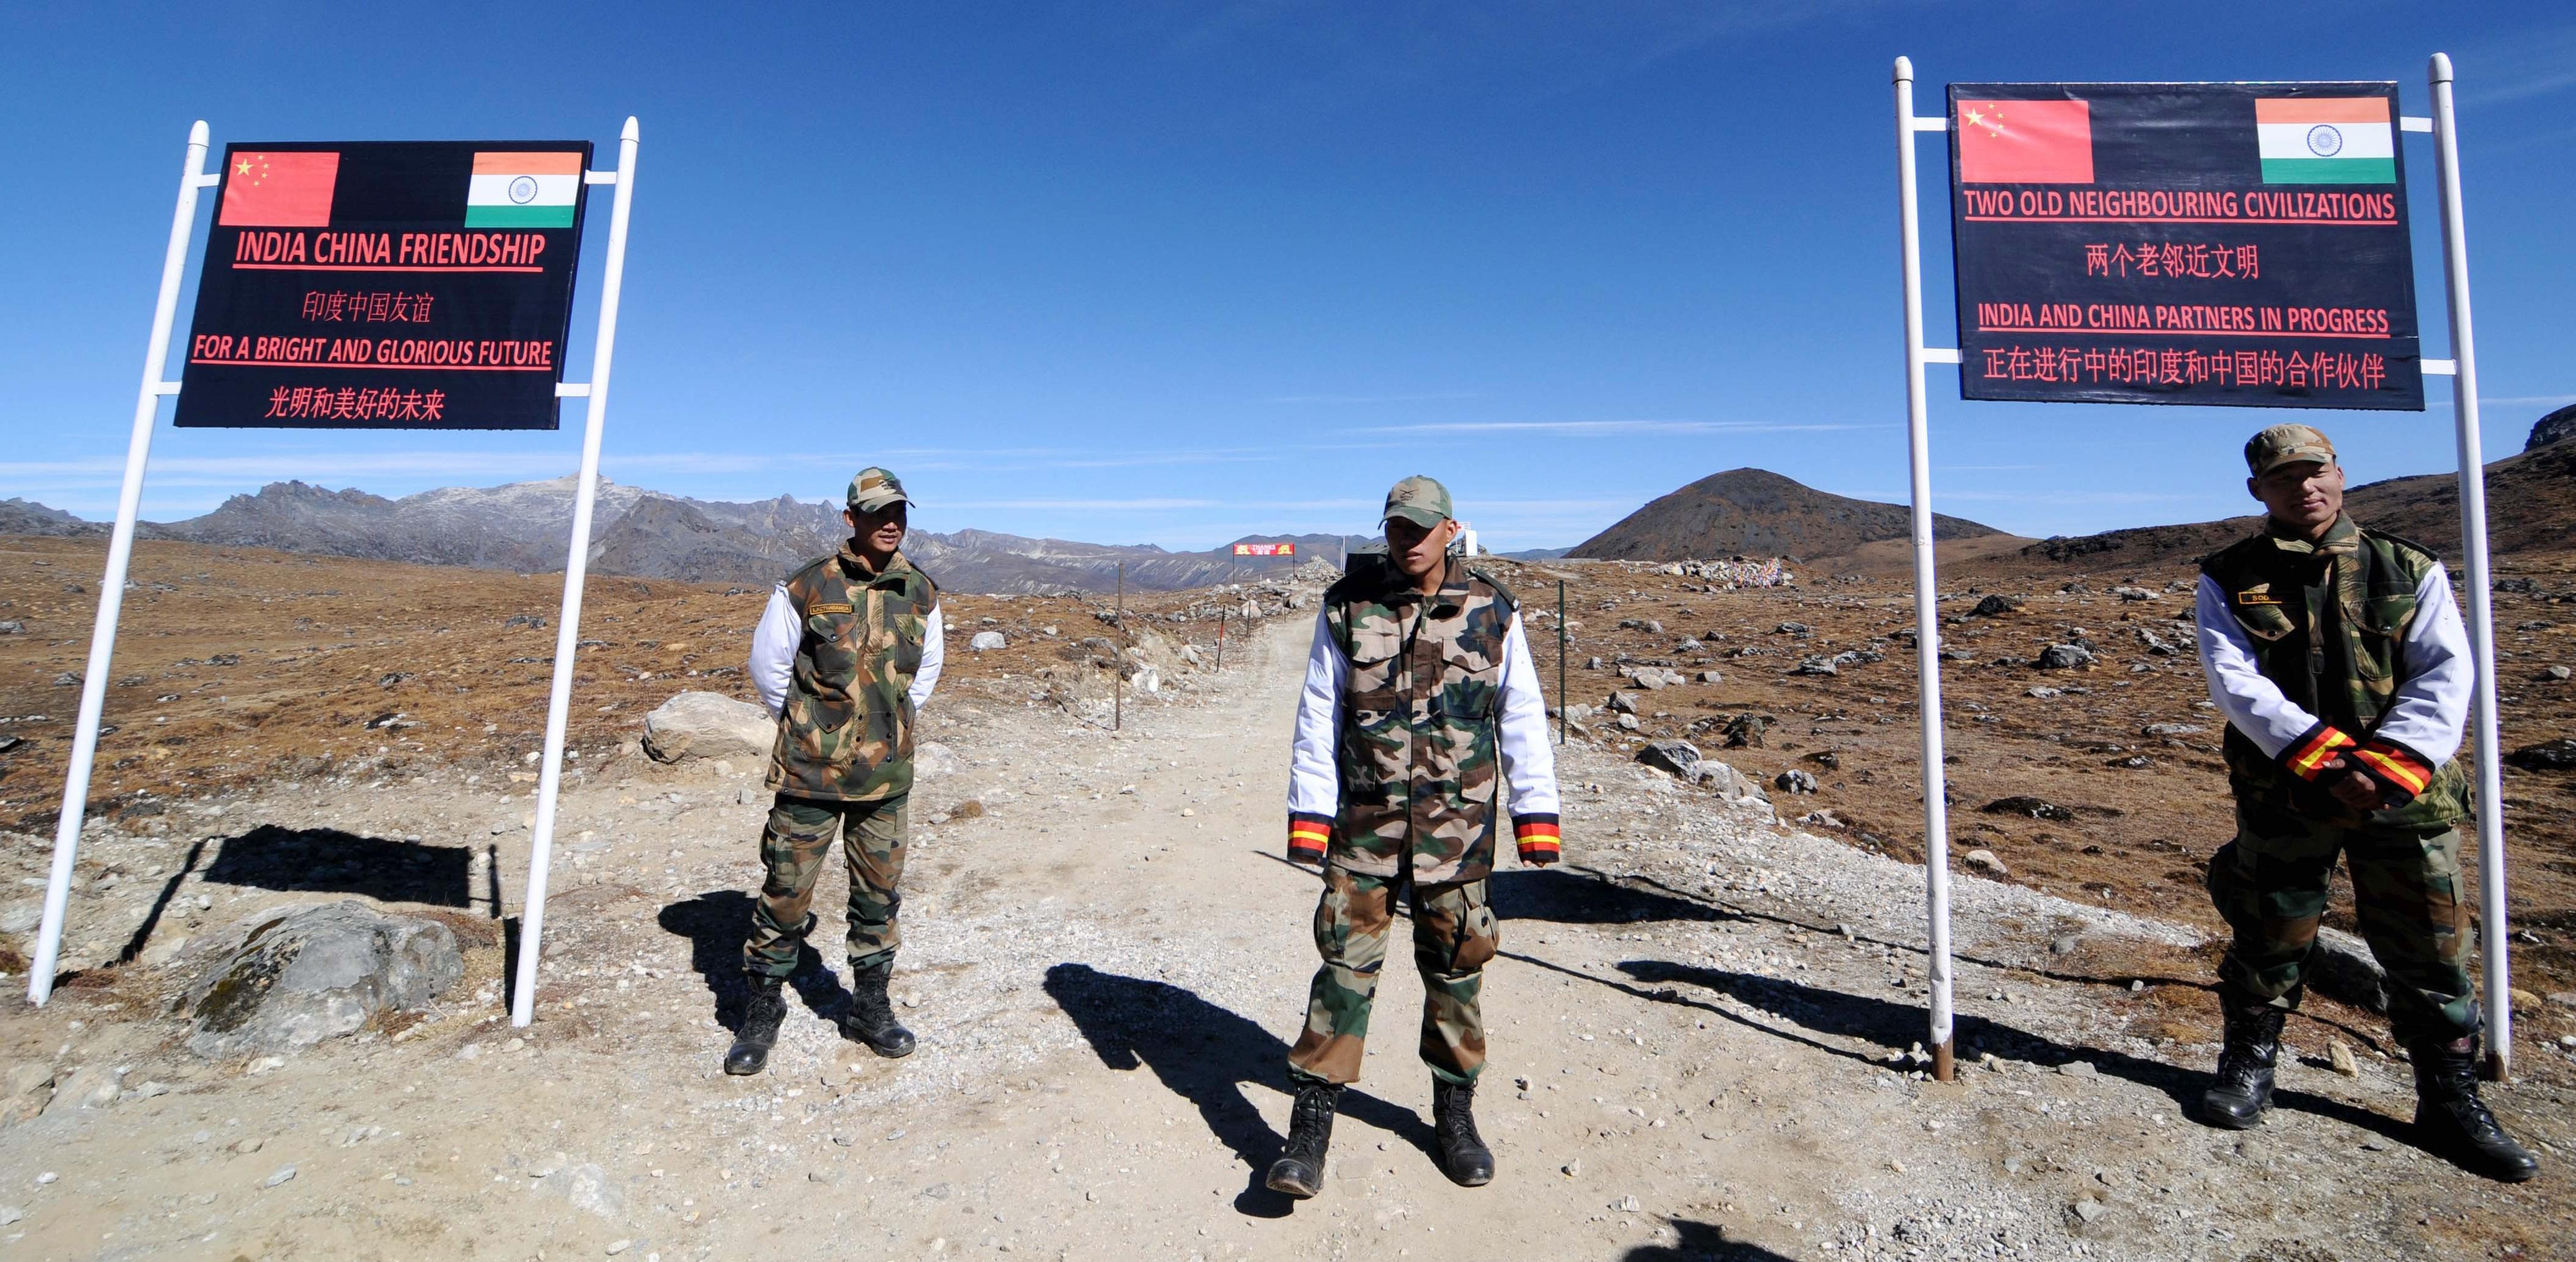 Analysis on China-India border stand-off 中印邊境對峙:原因、現狀與可能發展